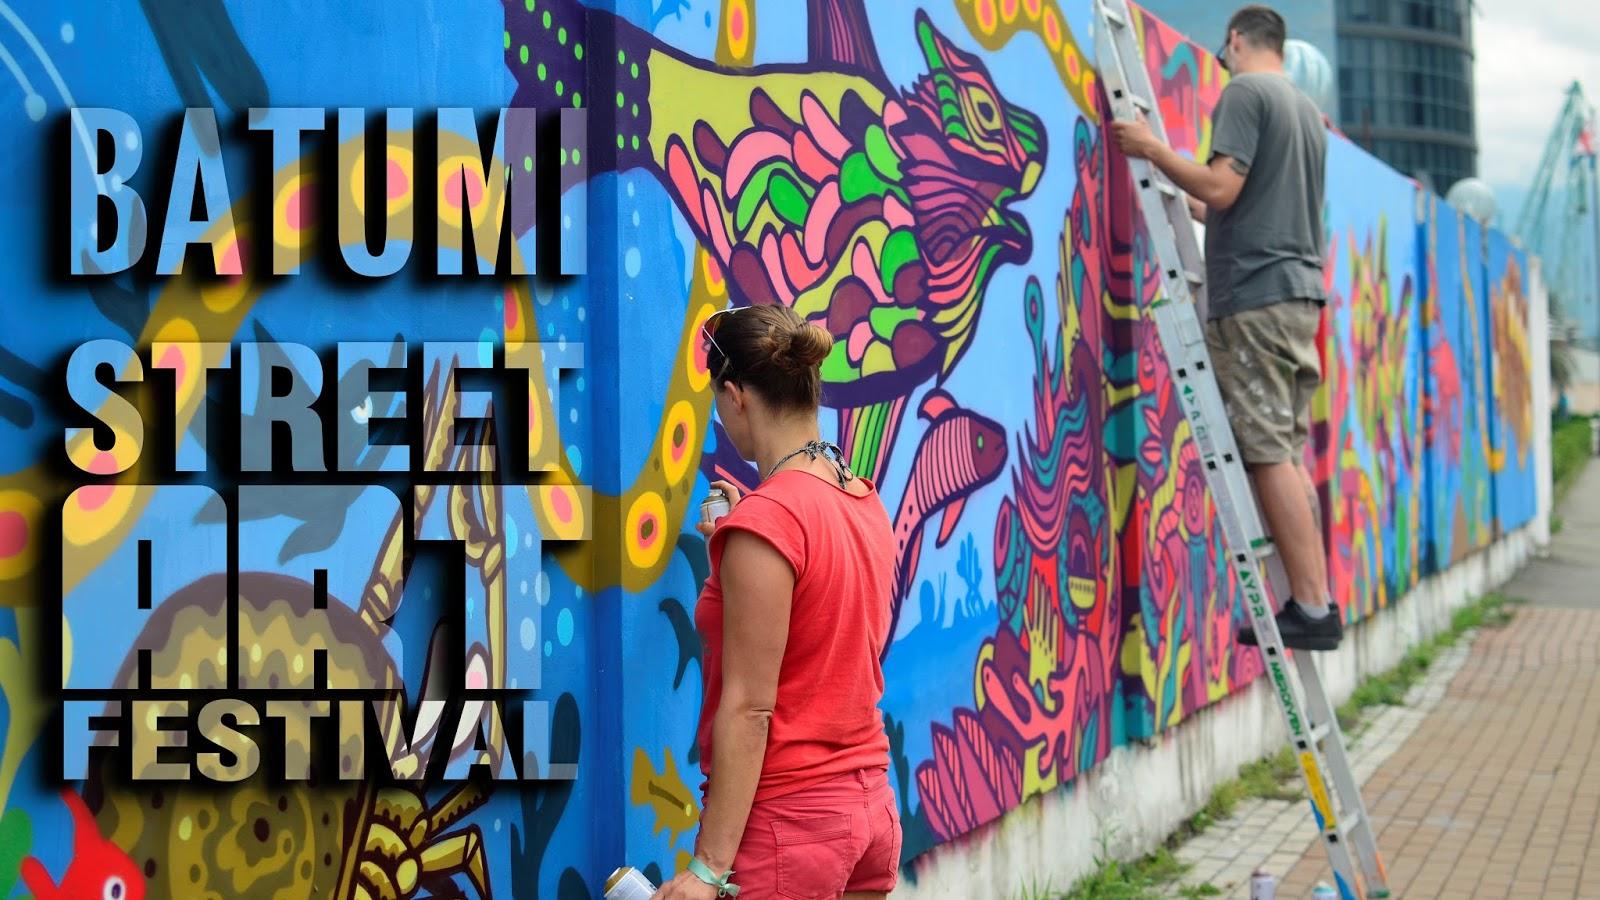 Street art festival BATUMI 2017